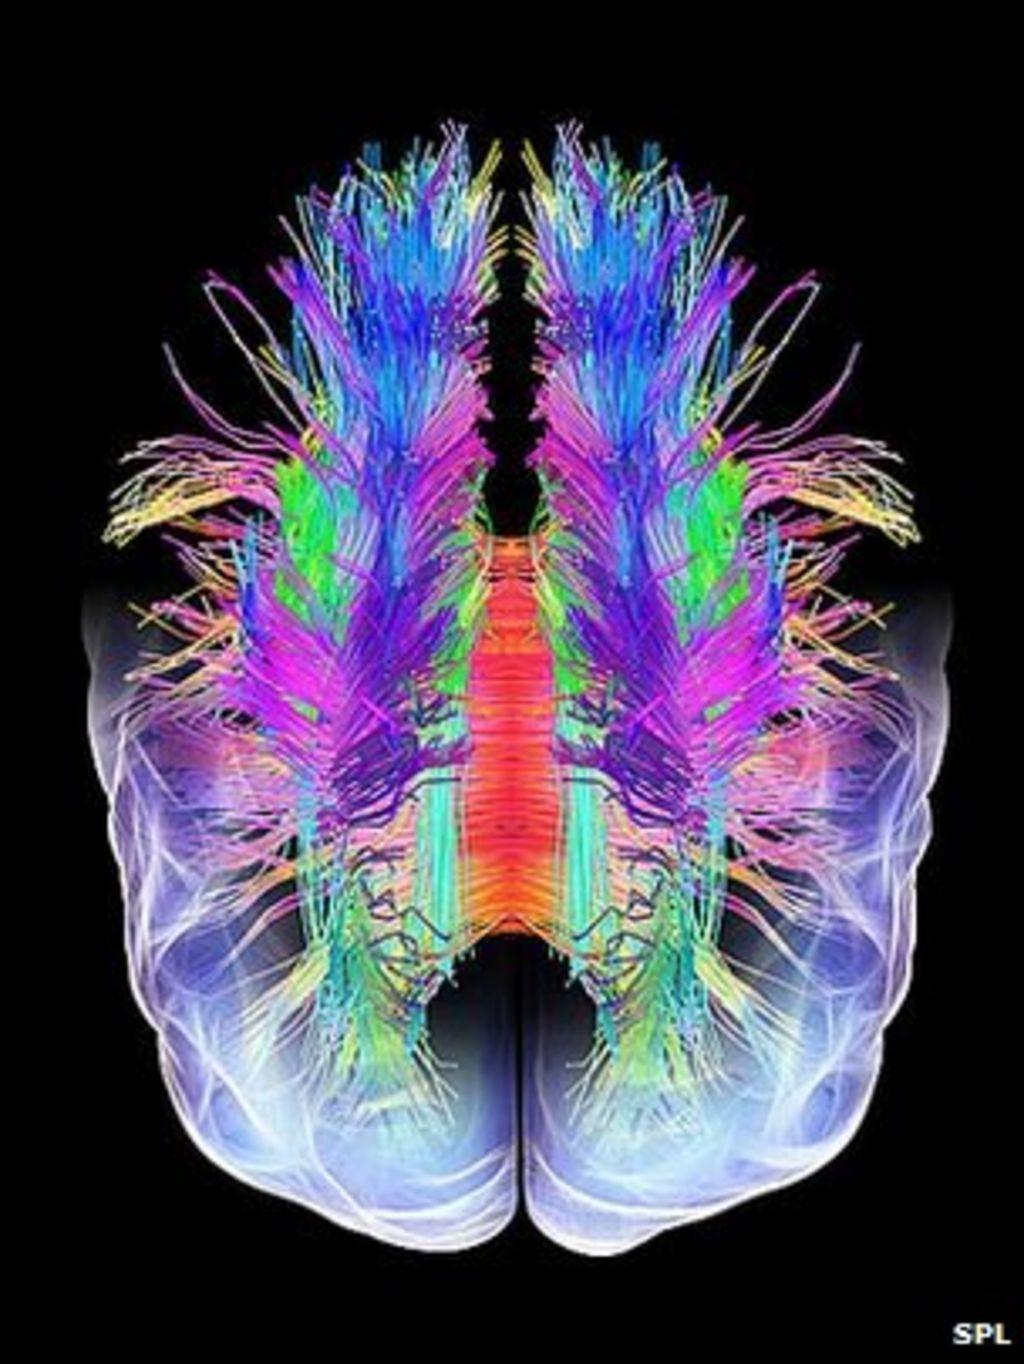 brain essay scan Using voxel based morphometry (vbm) applied to structural magnetic  resonance imaging (mri) scans of twenty social network site (sns).